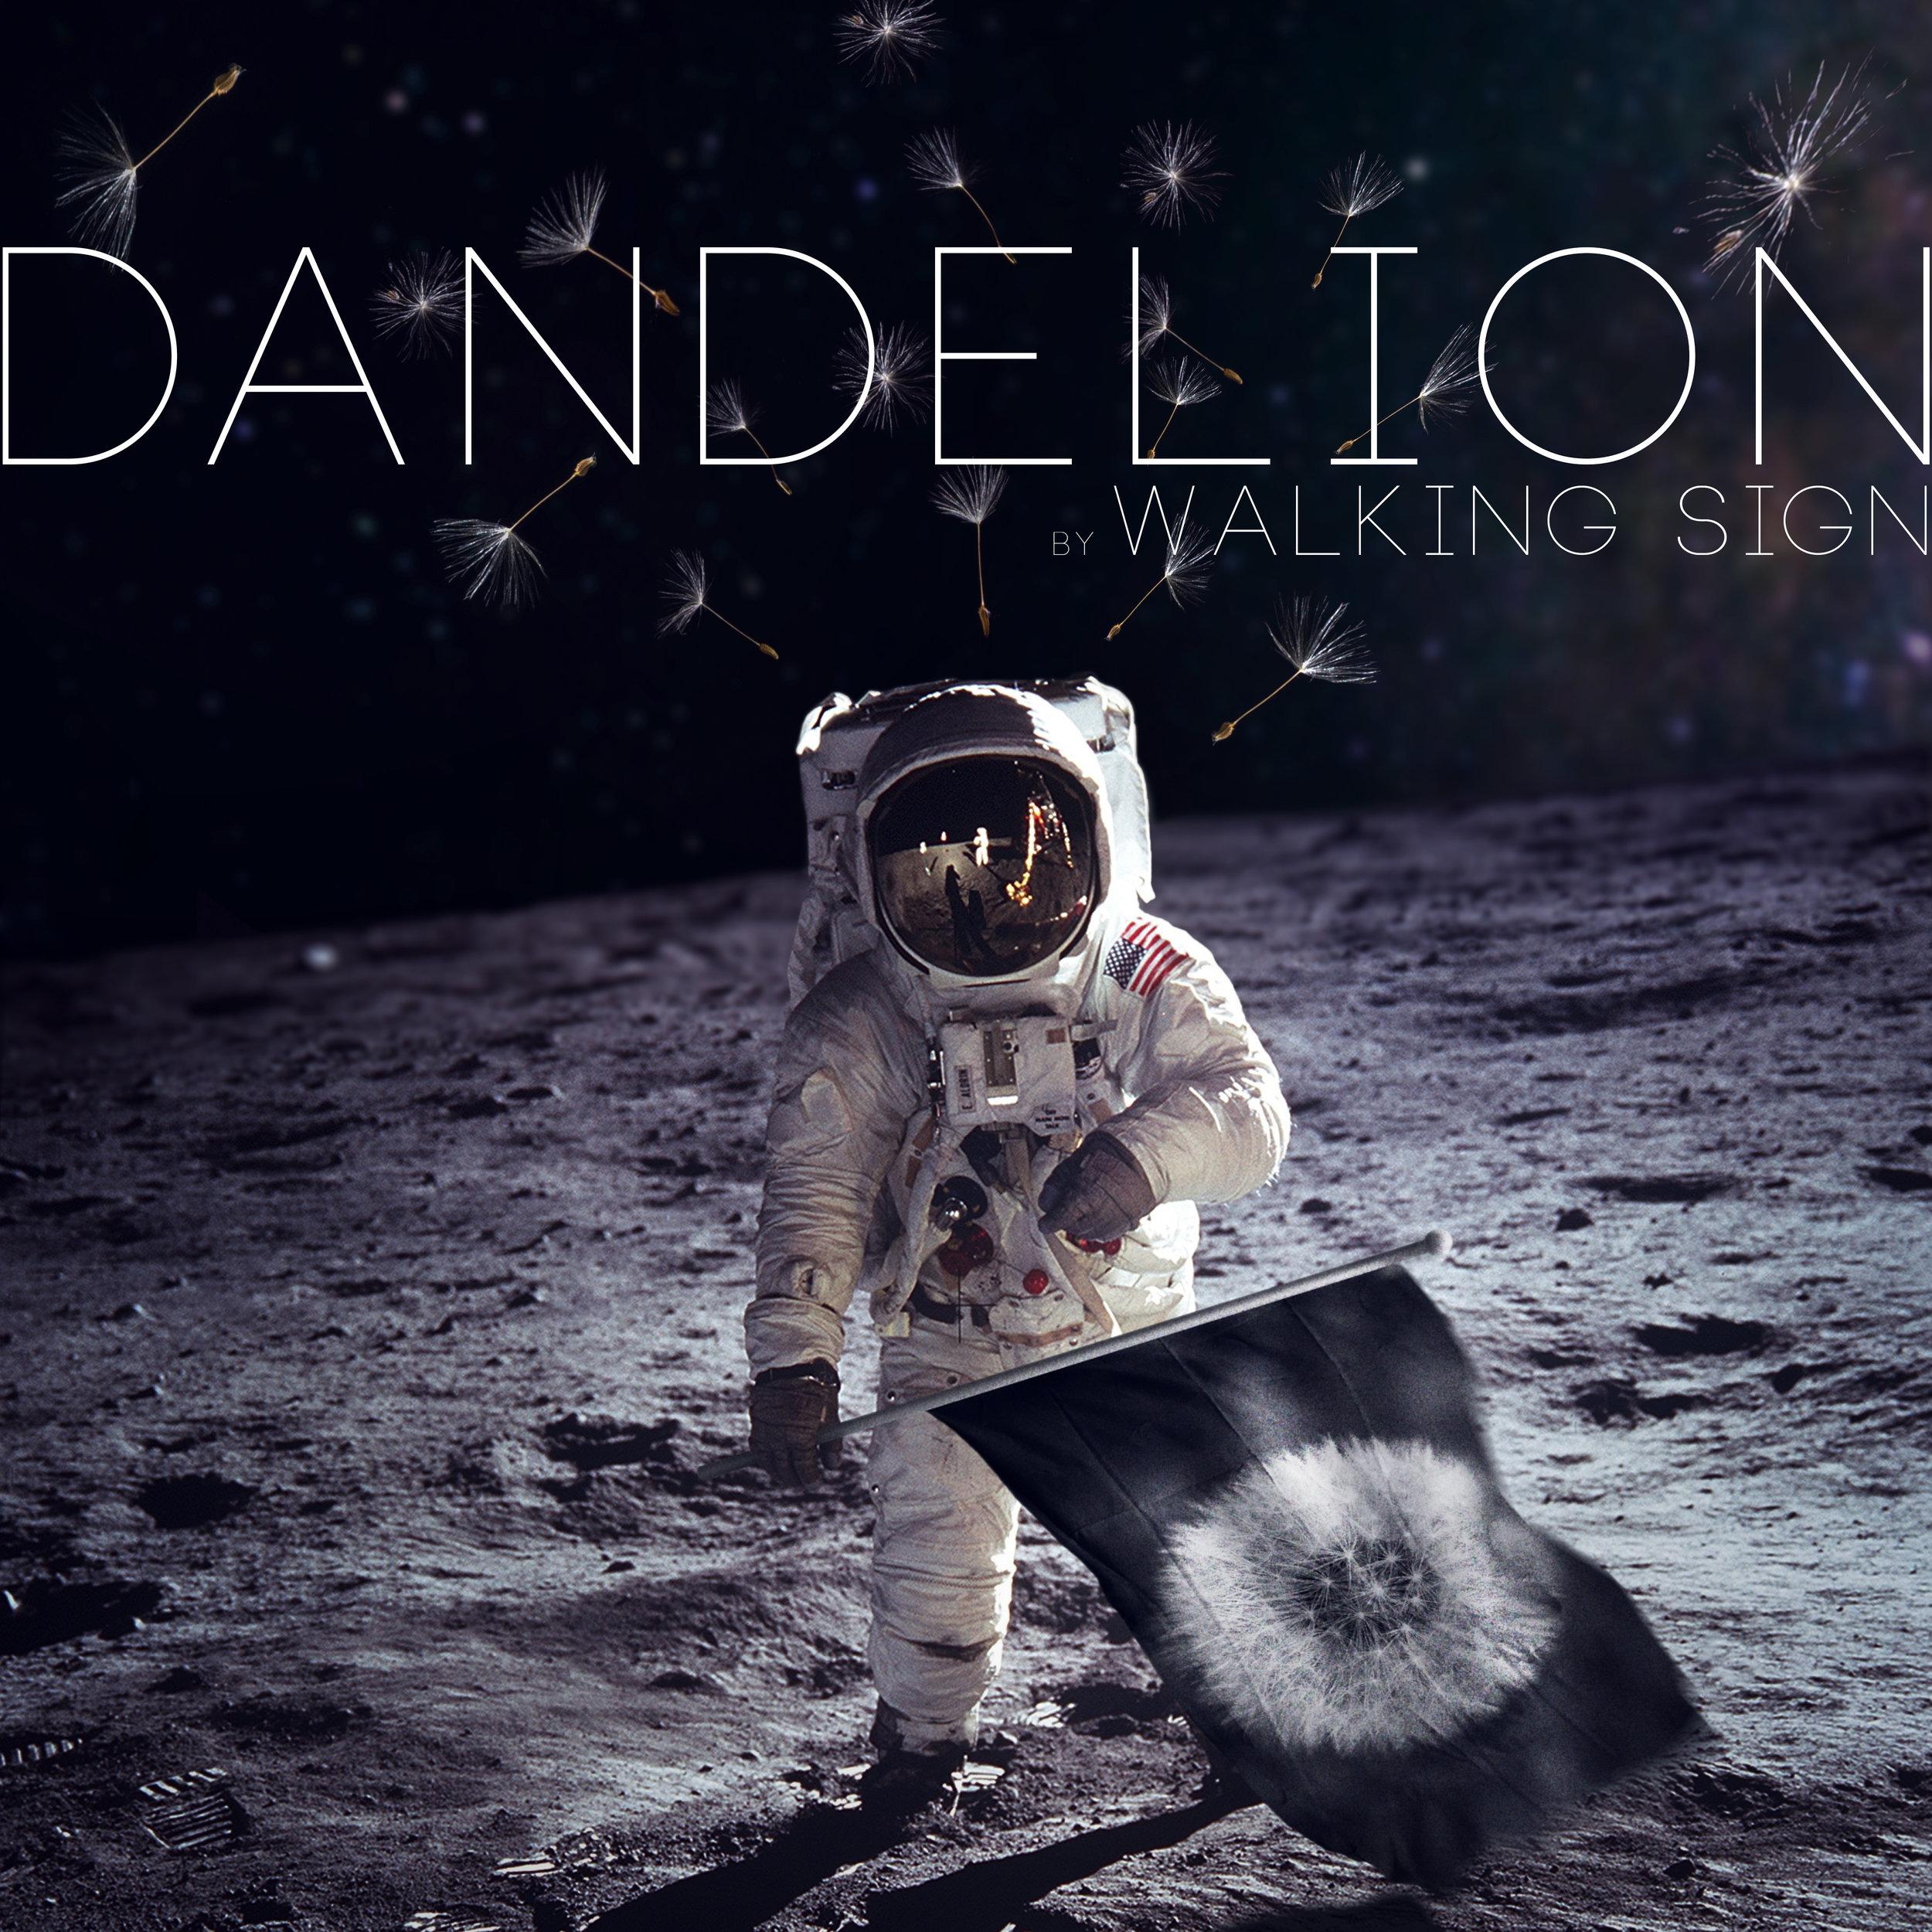 Dandelion Promo_1.jpg